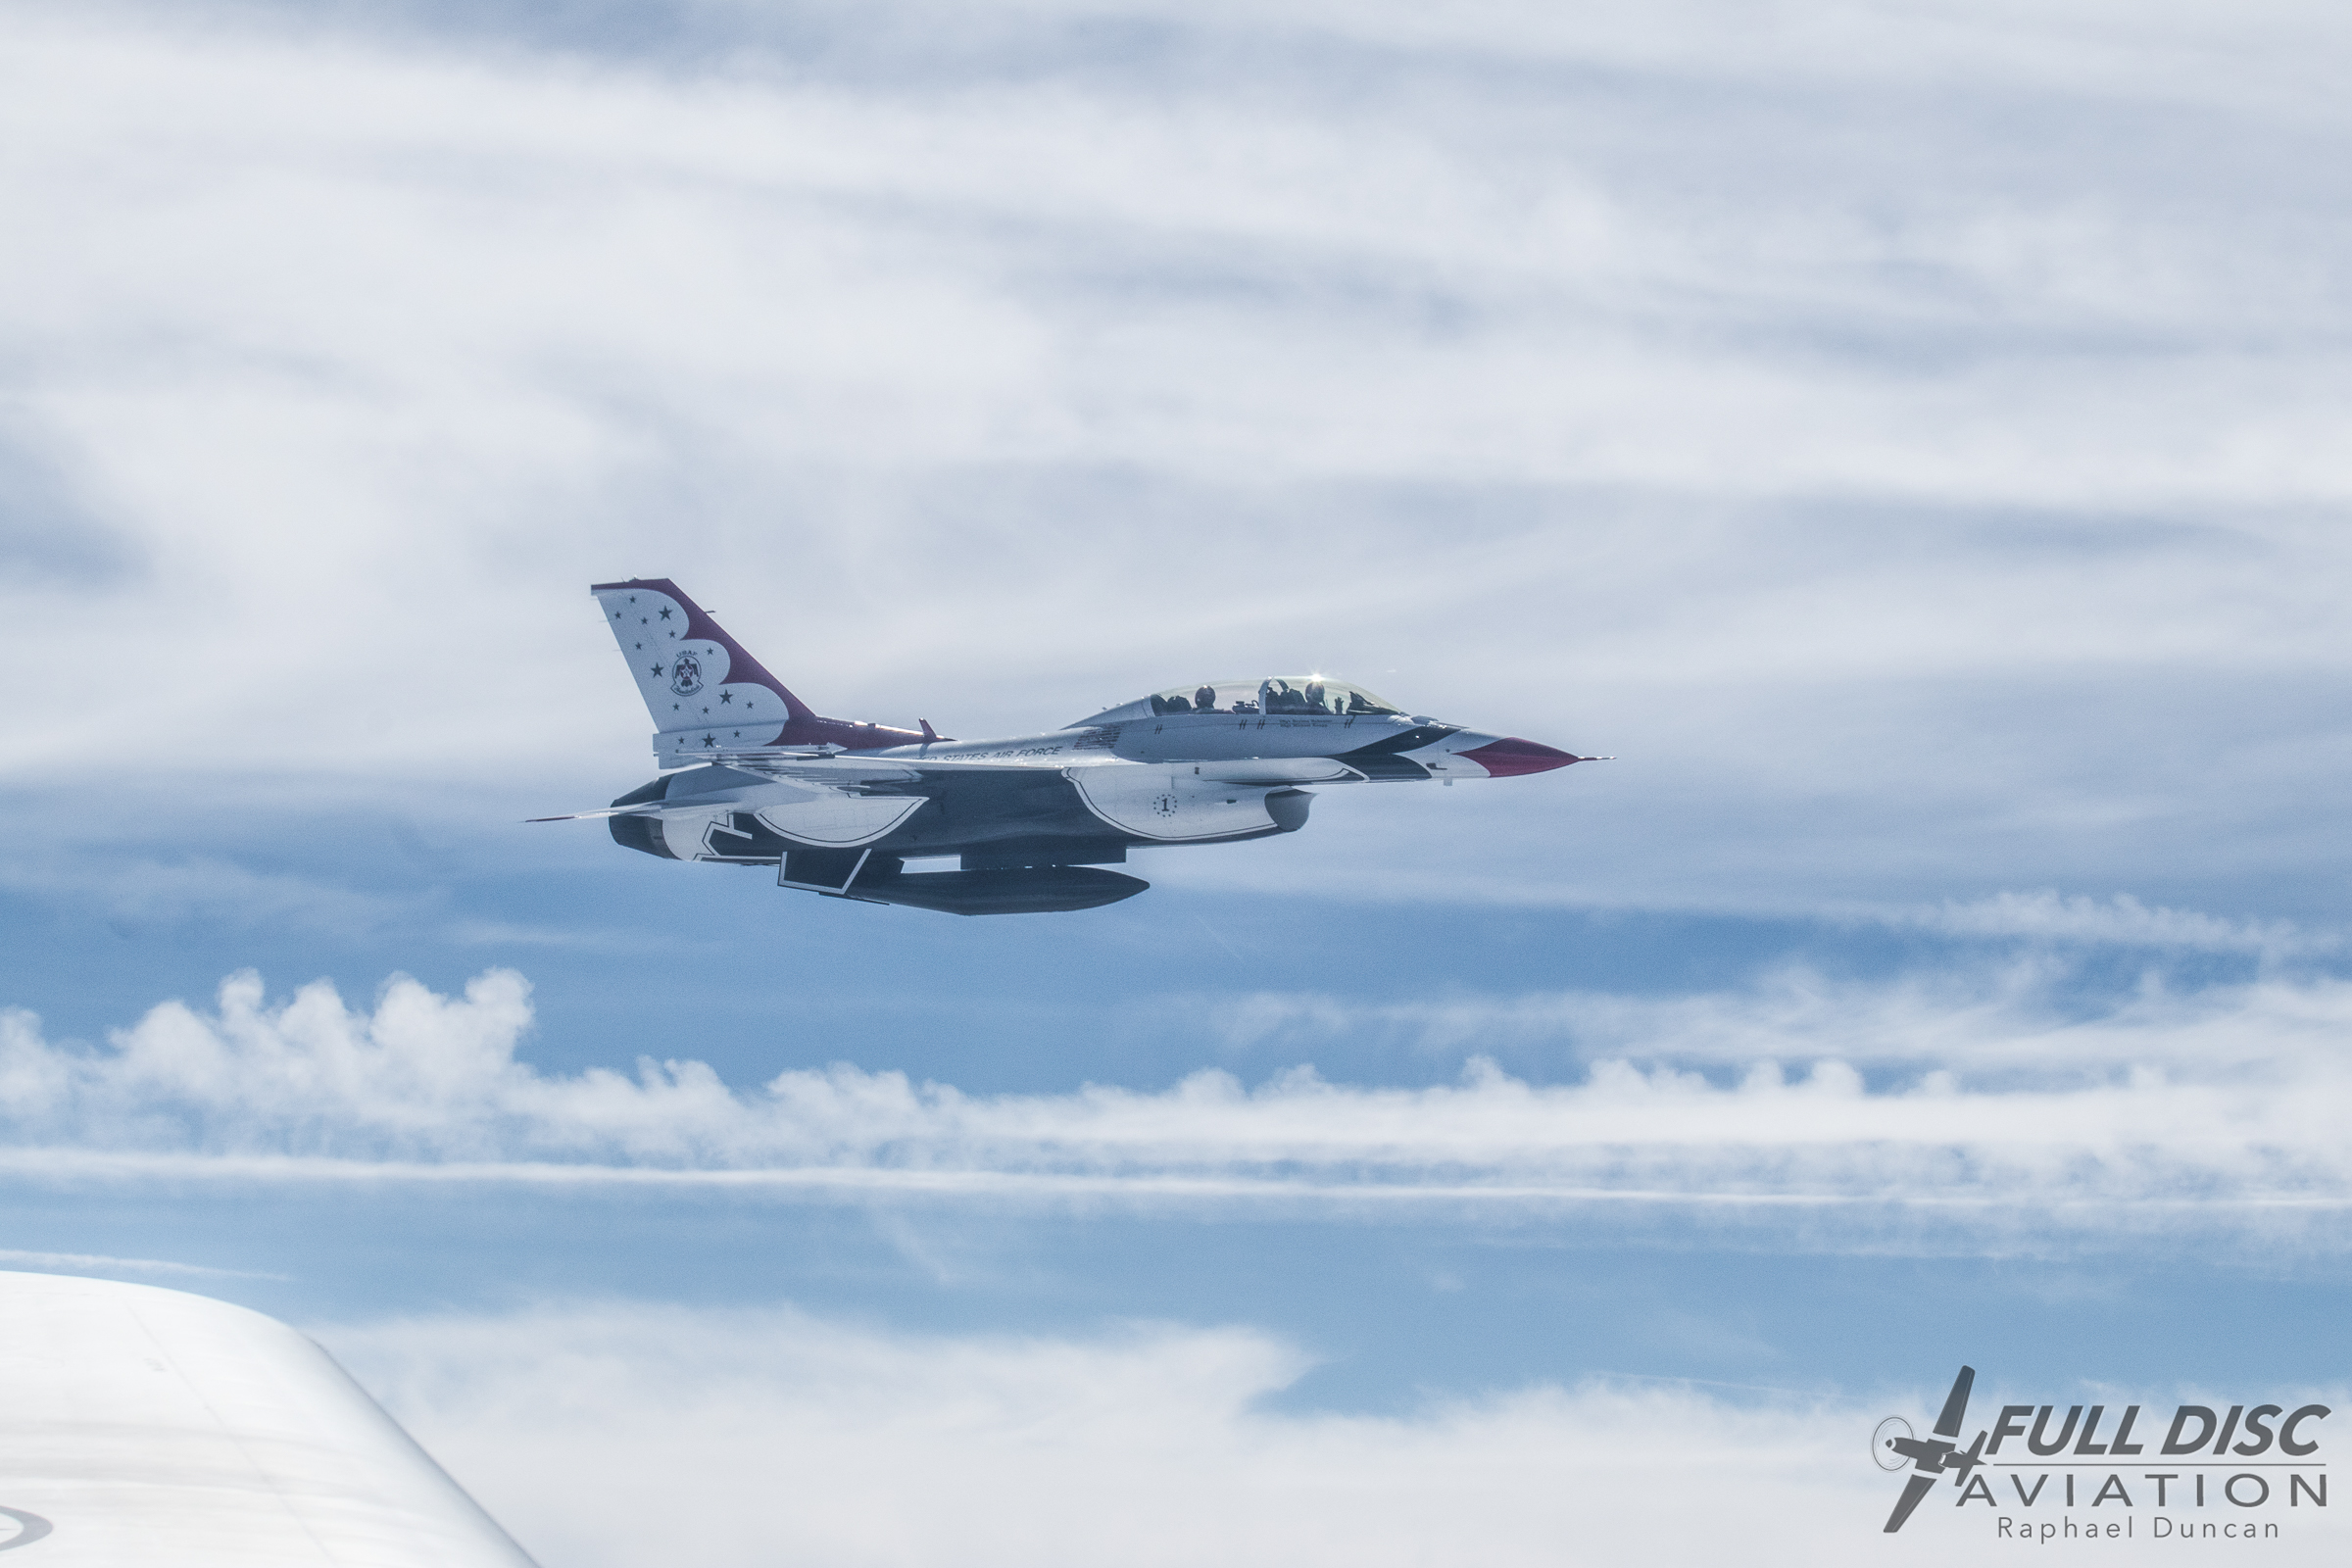 FullDiscAviaiton_RaphaelDuncan_Thunderbirds-February 18, 2019-01.jpg